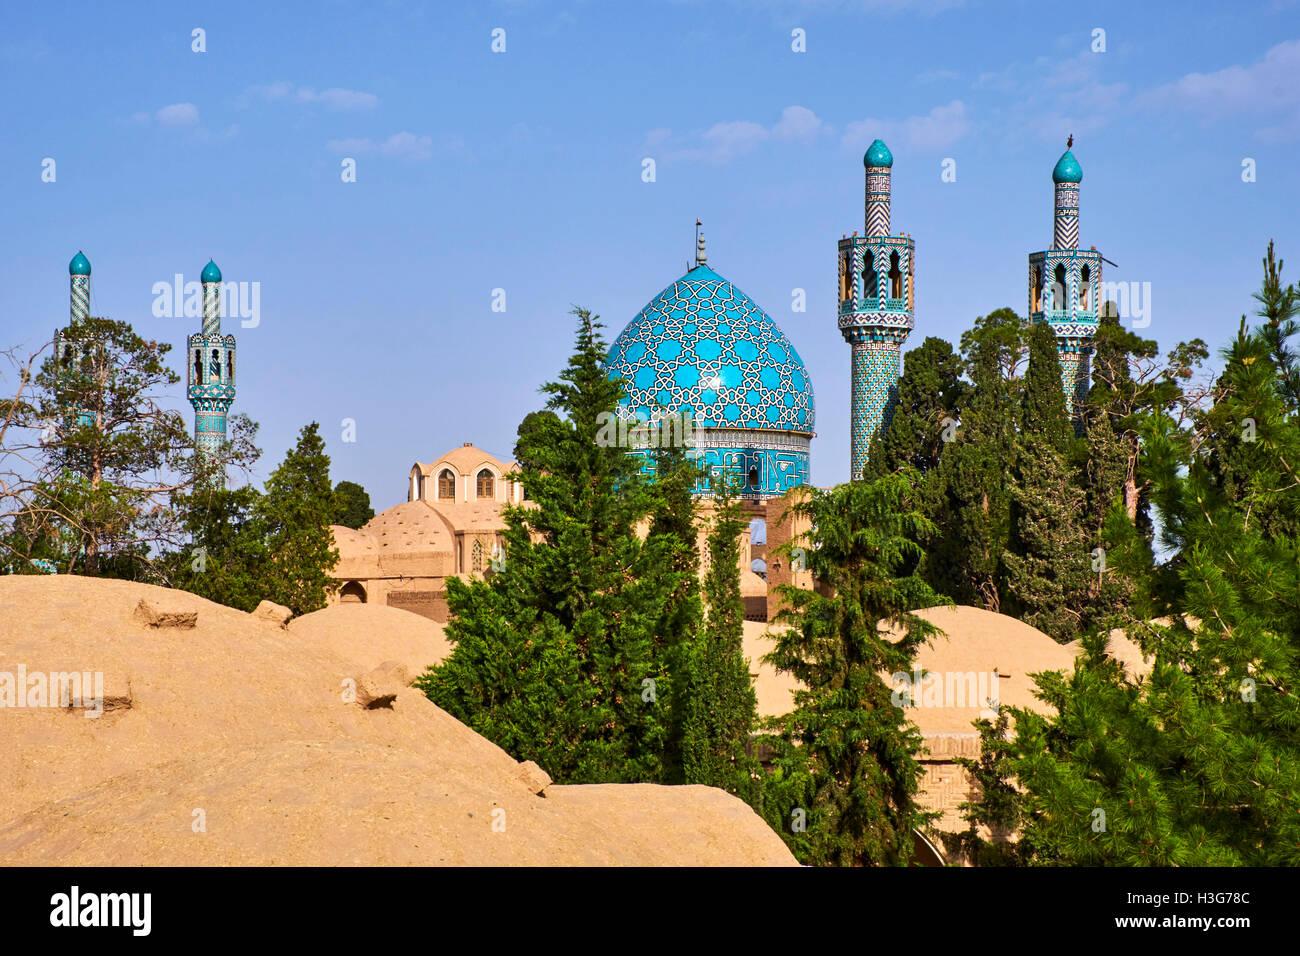 Iran, Kerman province, Mahan, tomb of sufi Shah Nematollah Wali - Stock Image